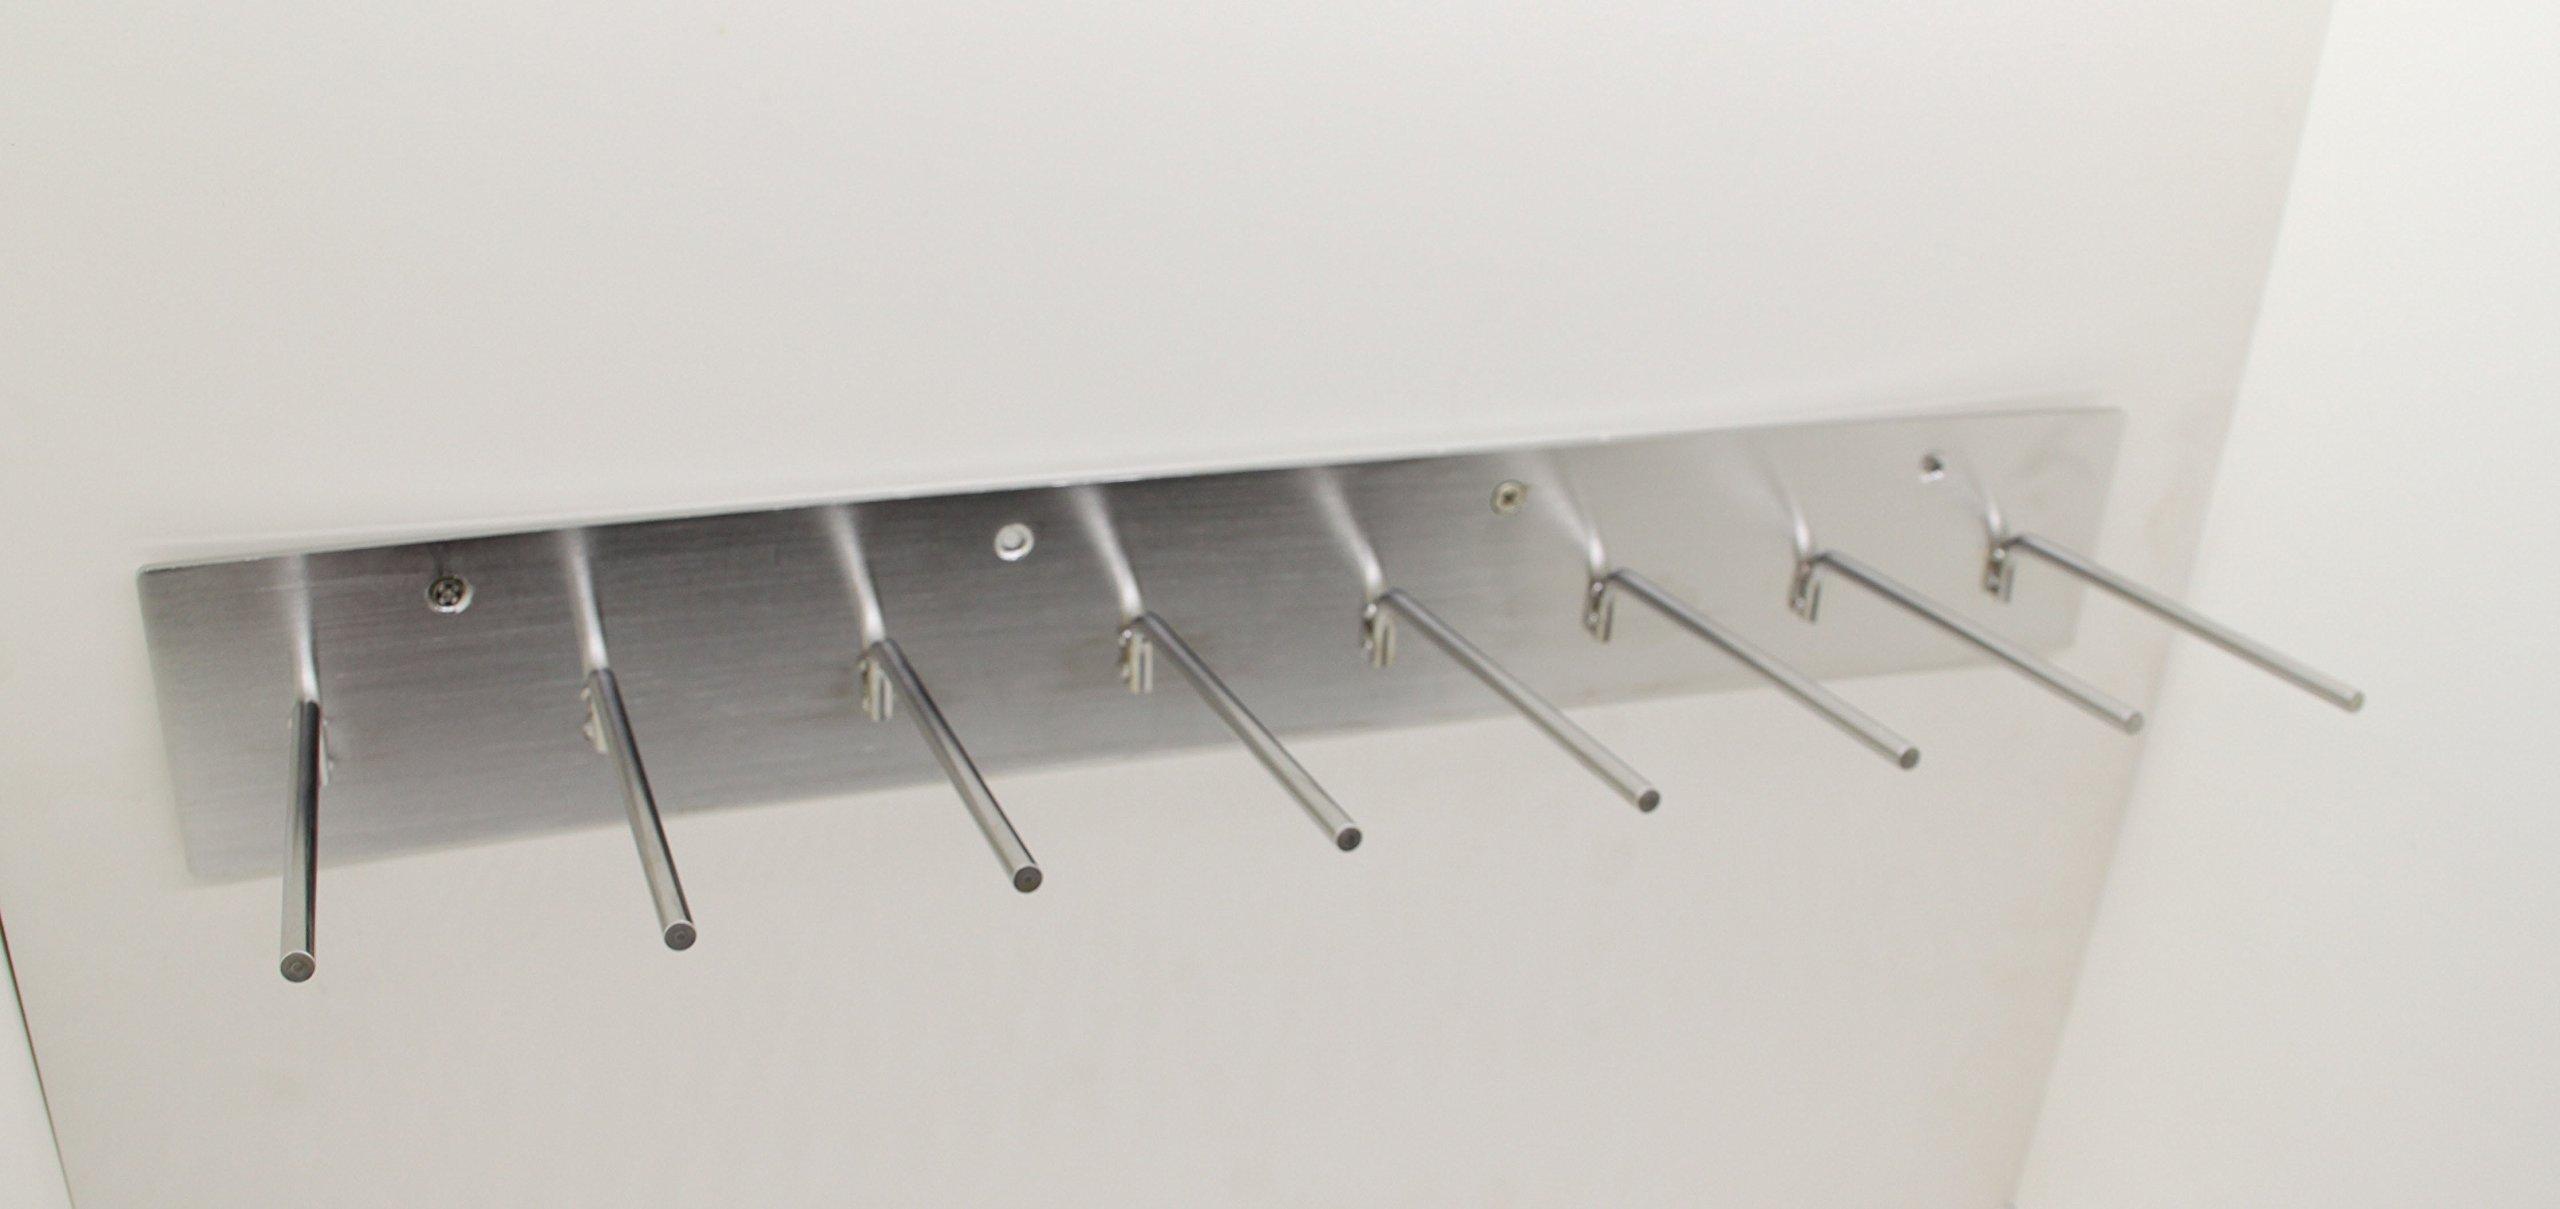 FixtureDisplays 8-PEG Lead Apron Wall-mount Hook Hanger 15687